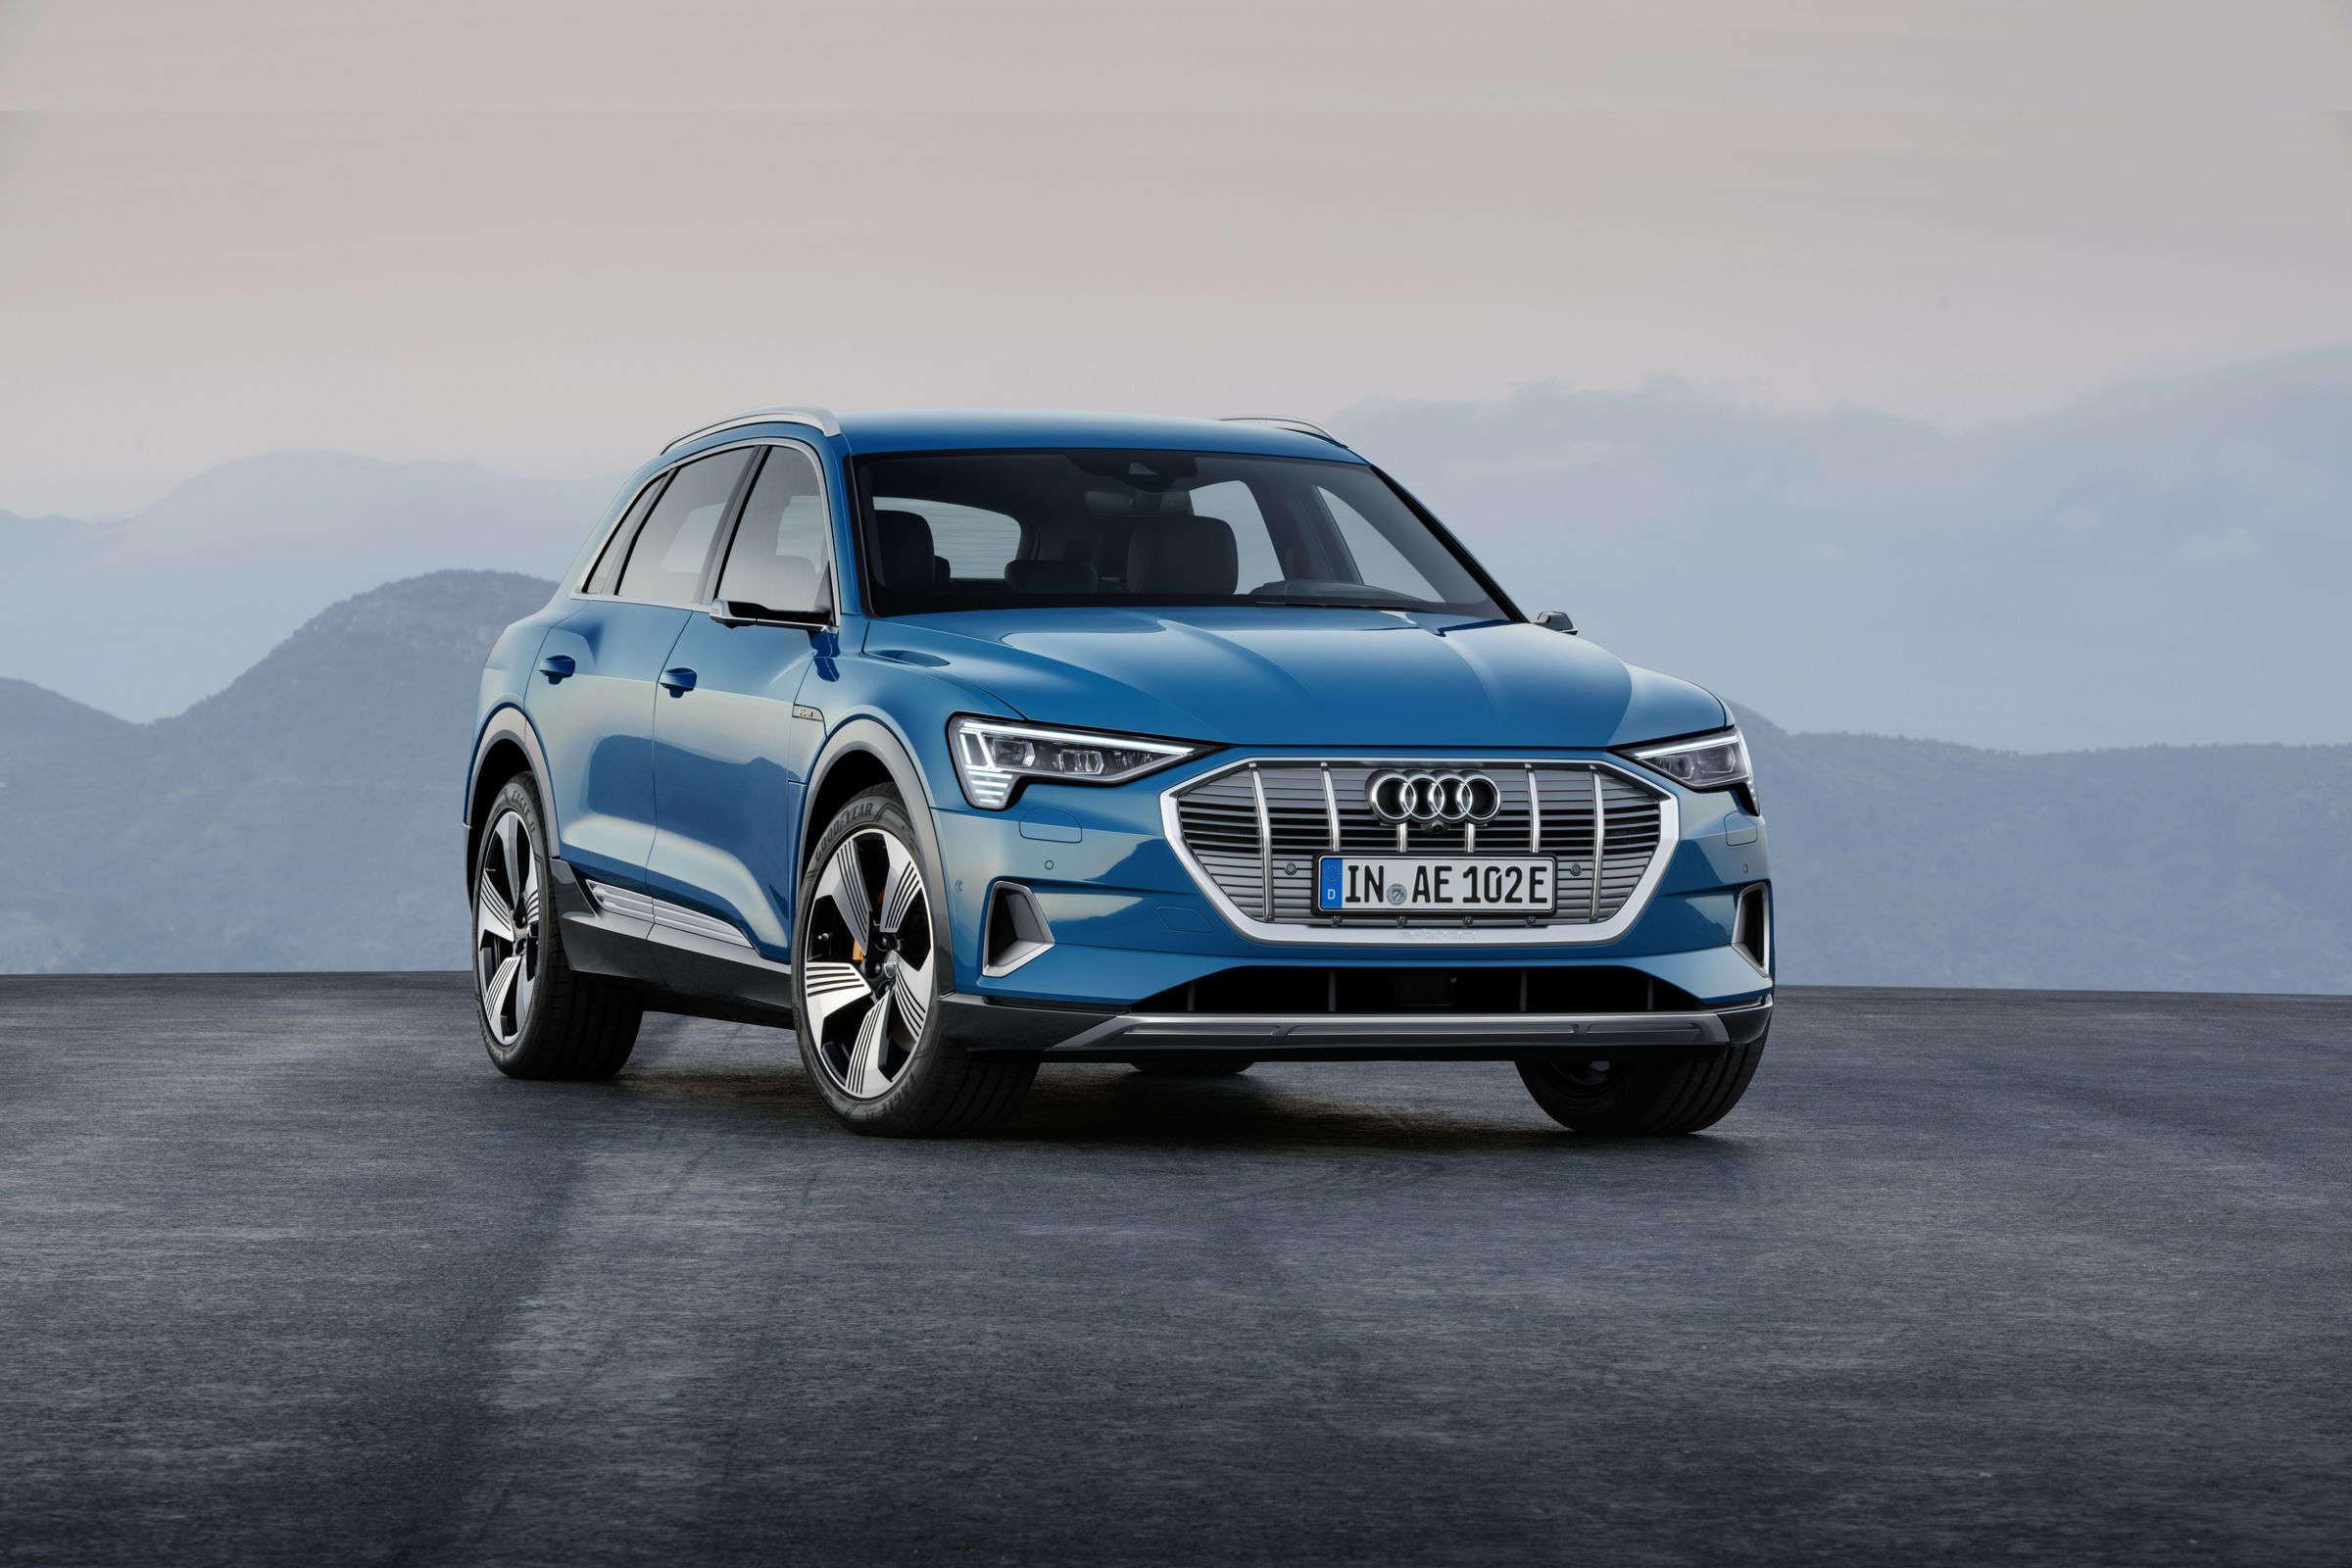 Audi San Francisco >> Así es el Audi e-tron 2019, el primer coche completamente eléctrico de Audi   Motor ...